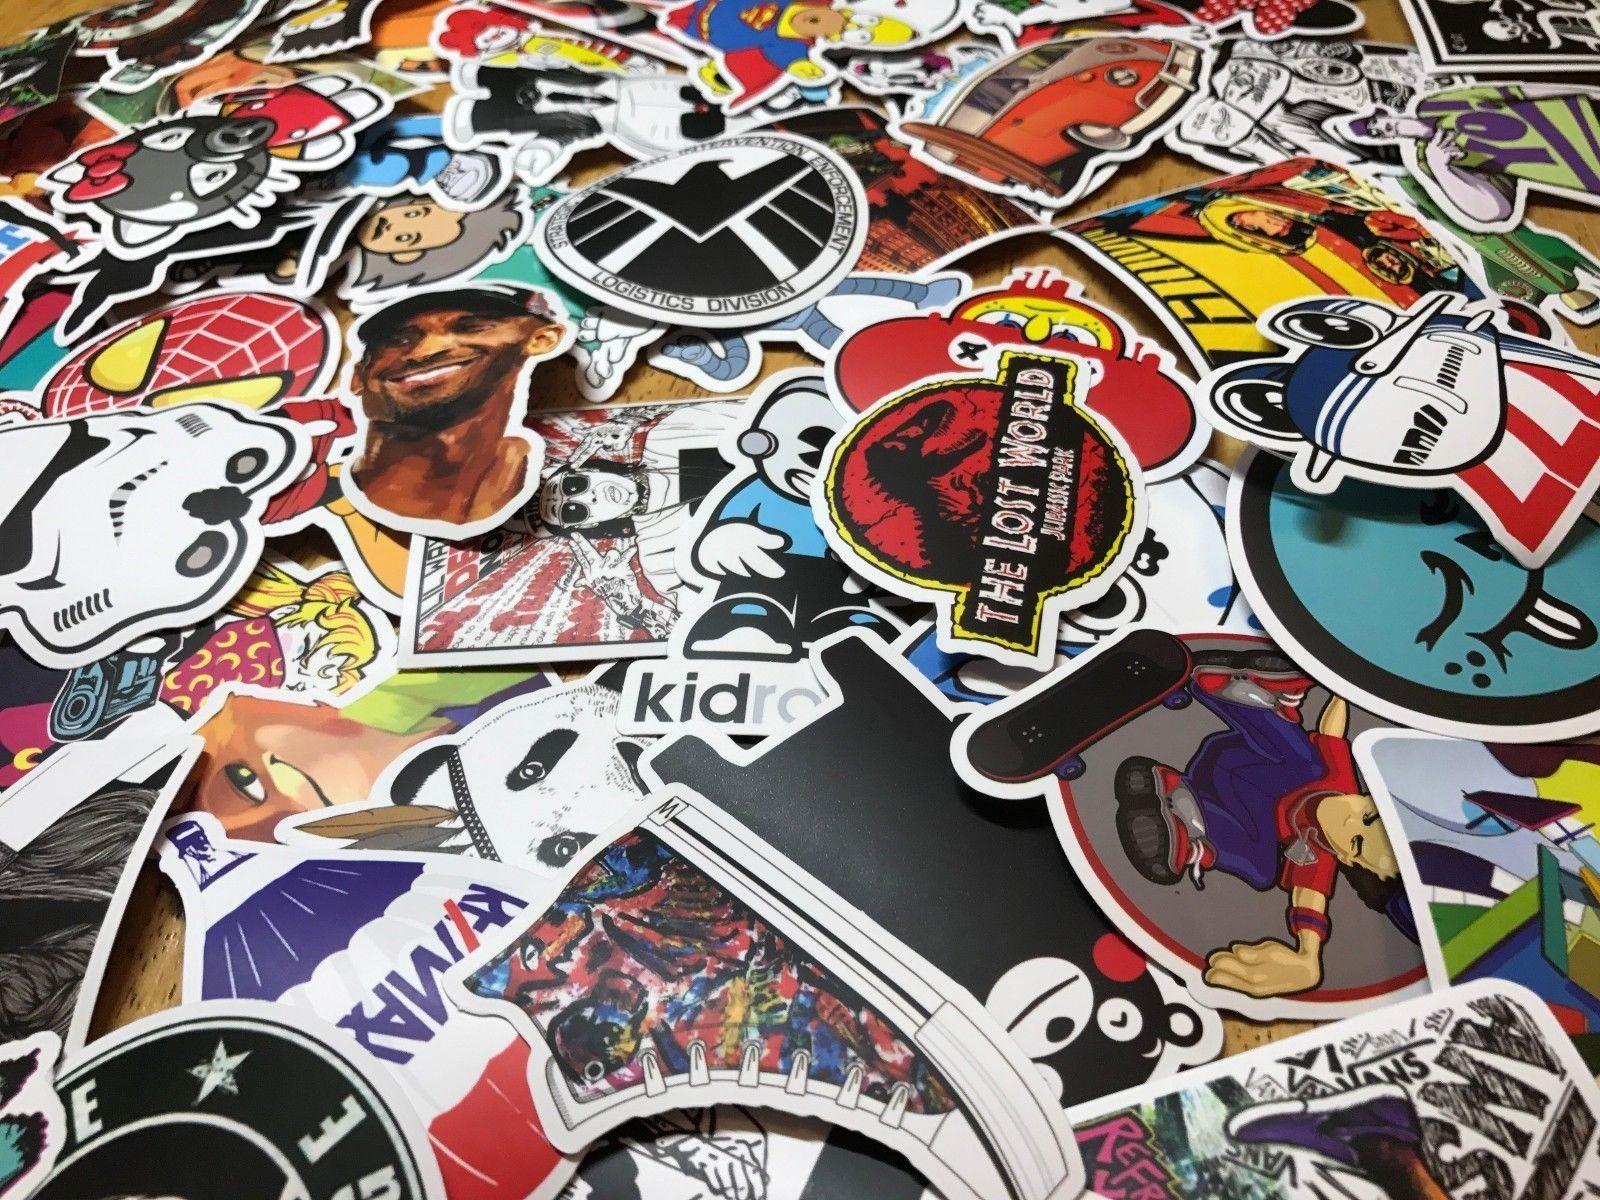 100 Pcs Sticker Pack Cool Vinyl Sticker Lot Aesthetic Computer Stickers Tumblr Stickers Cute Travel Sticker Pun Computer Sticker Stickers Packs Sticker Bomb [ 1200 x 1600 Pixel ]